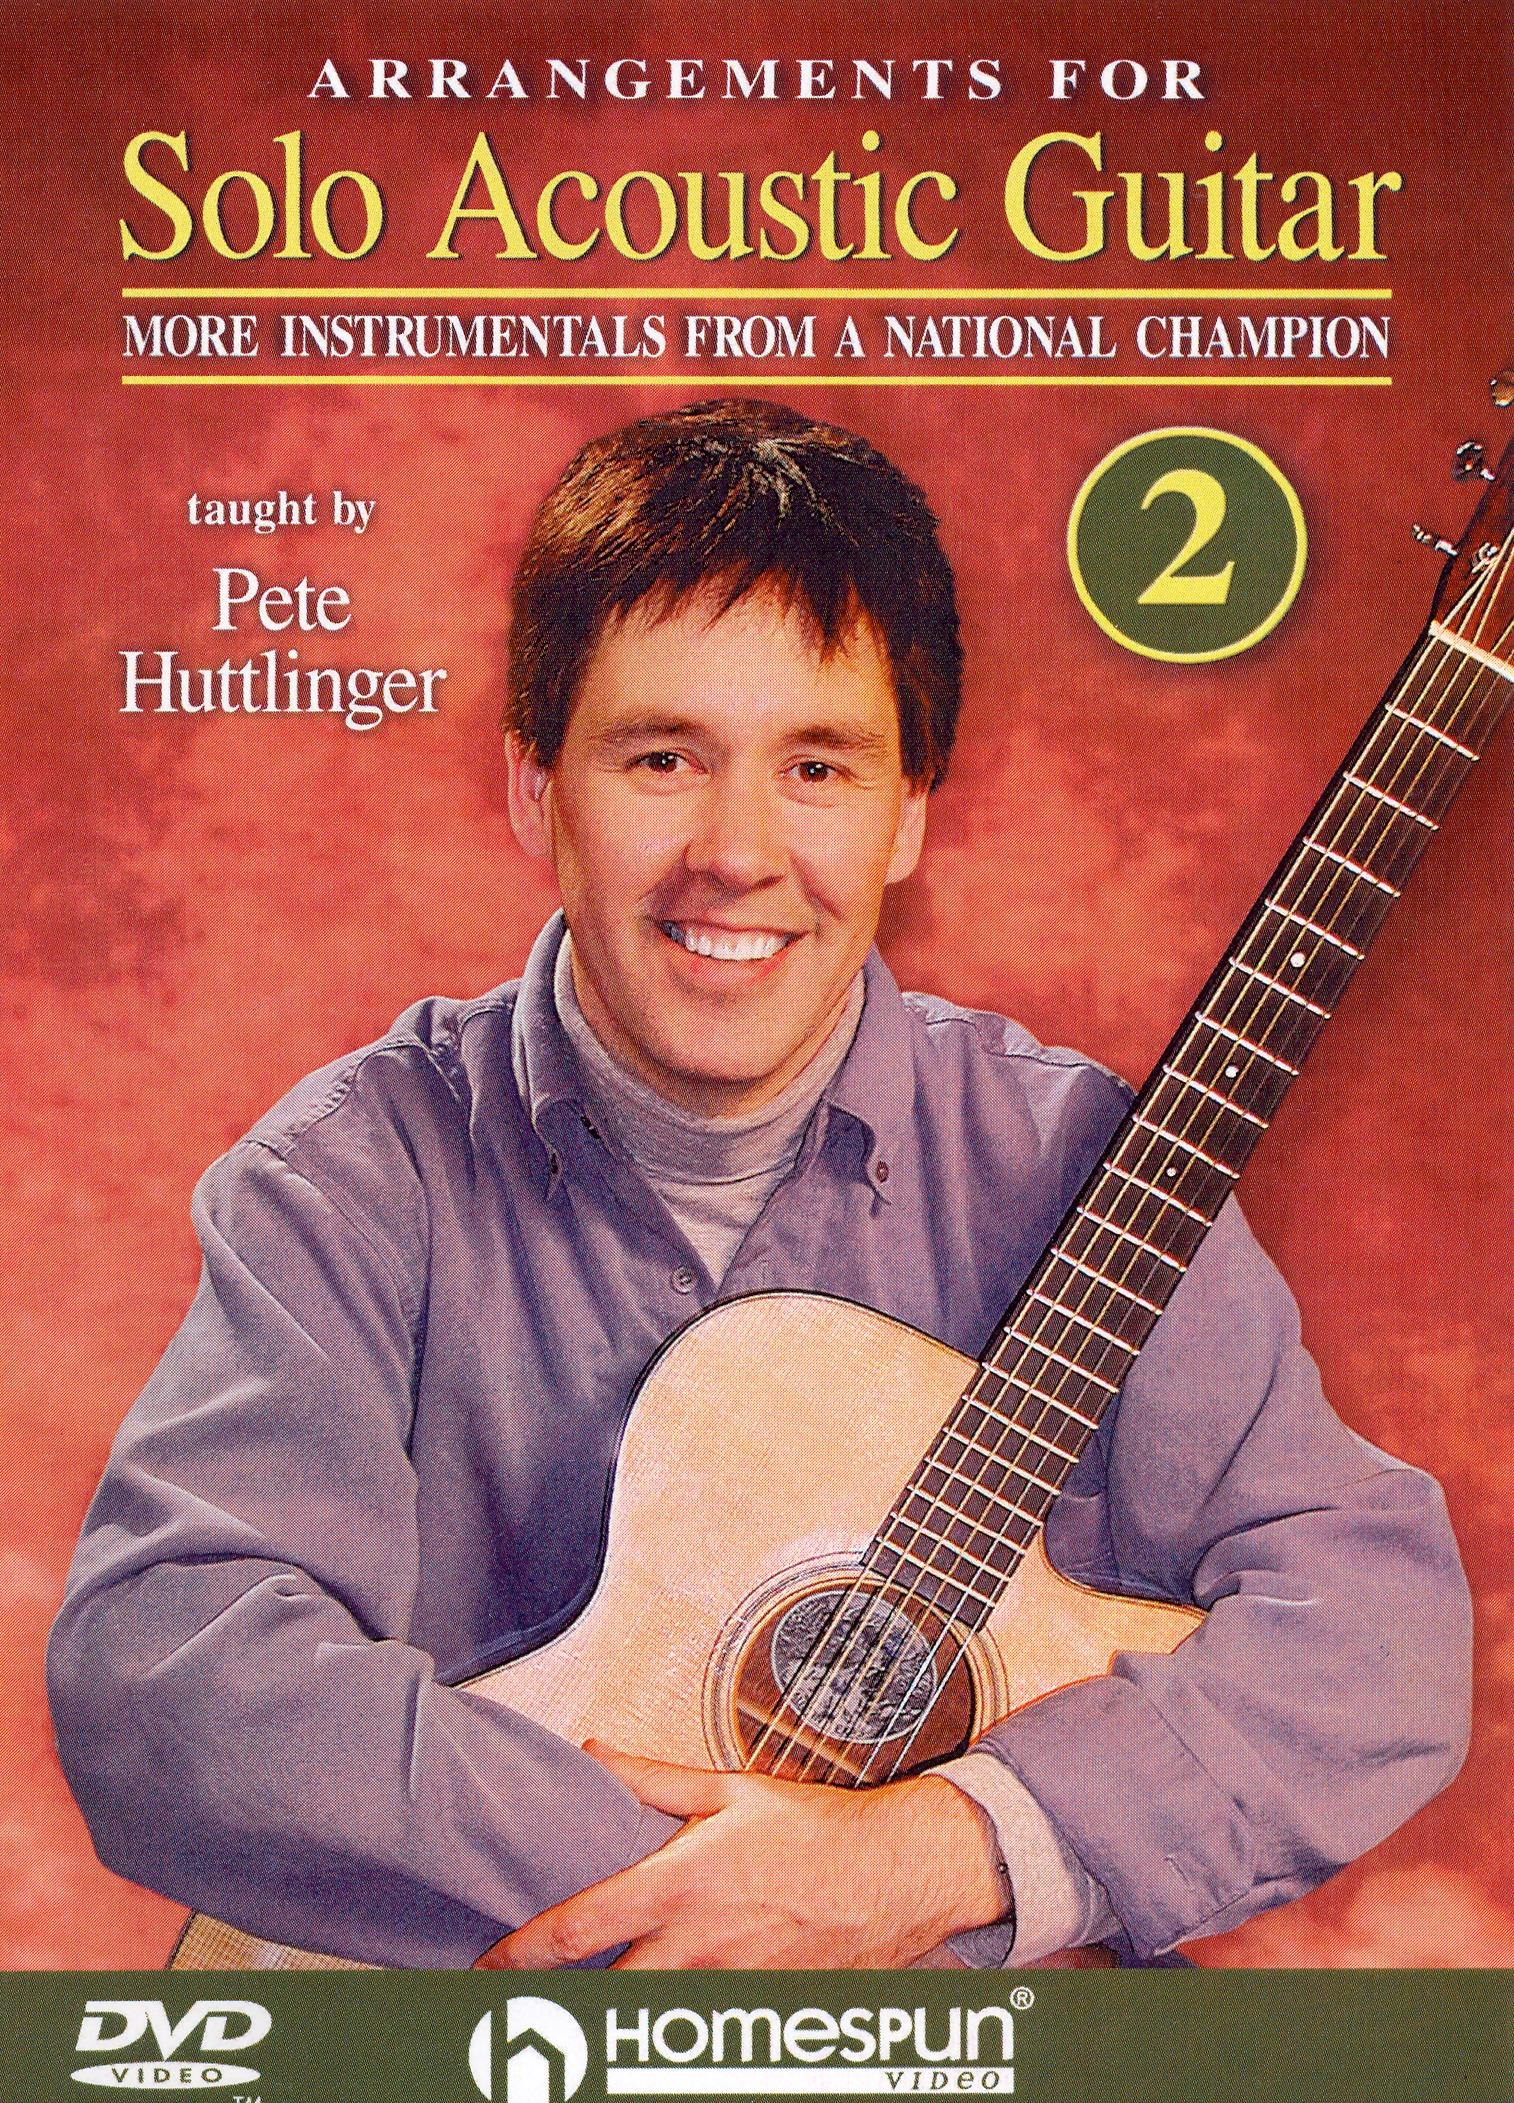 Peter Huttlinger: Arrangements for Solo Acoustic Guitar, Lesson 2